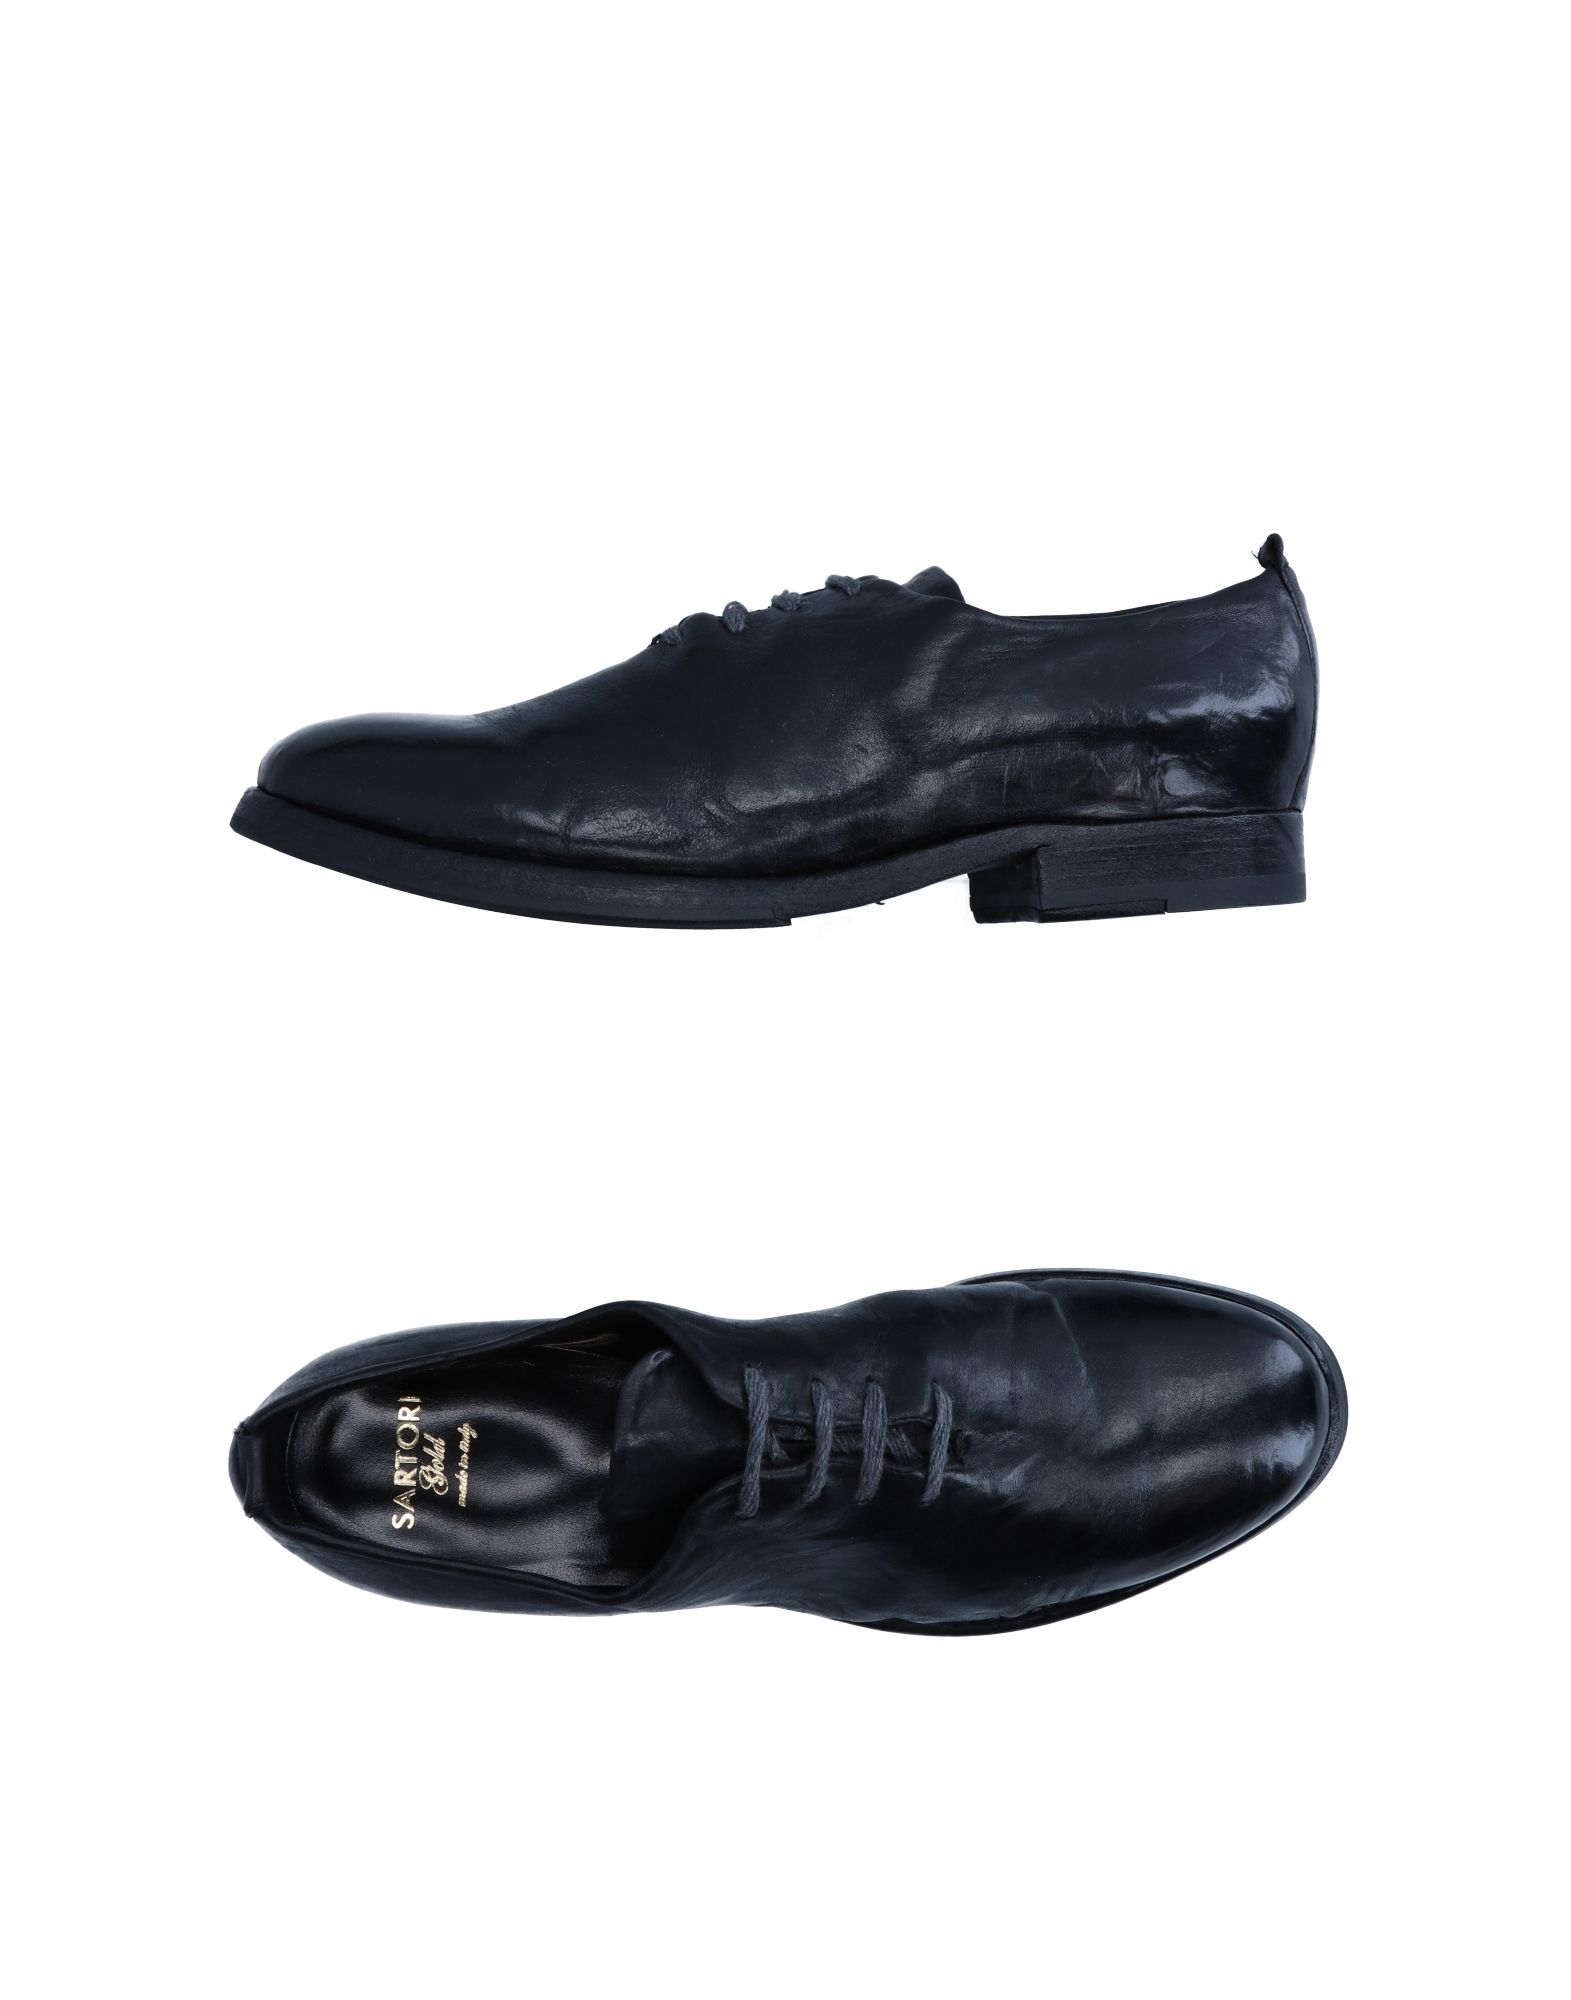 Stilvolle billige Schuhe Sartori 11245570JG Gold Schnürschuhe Damen  11245570JG Sartori aae5f5